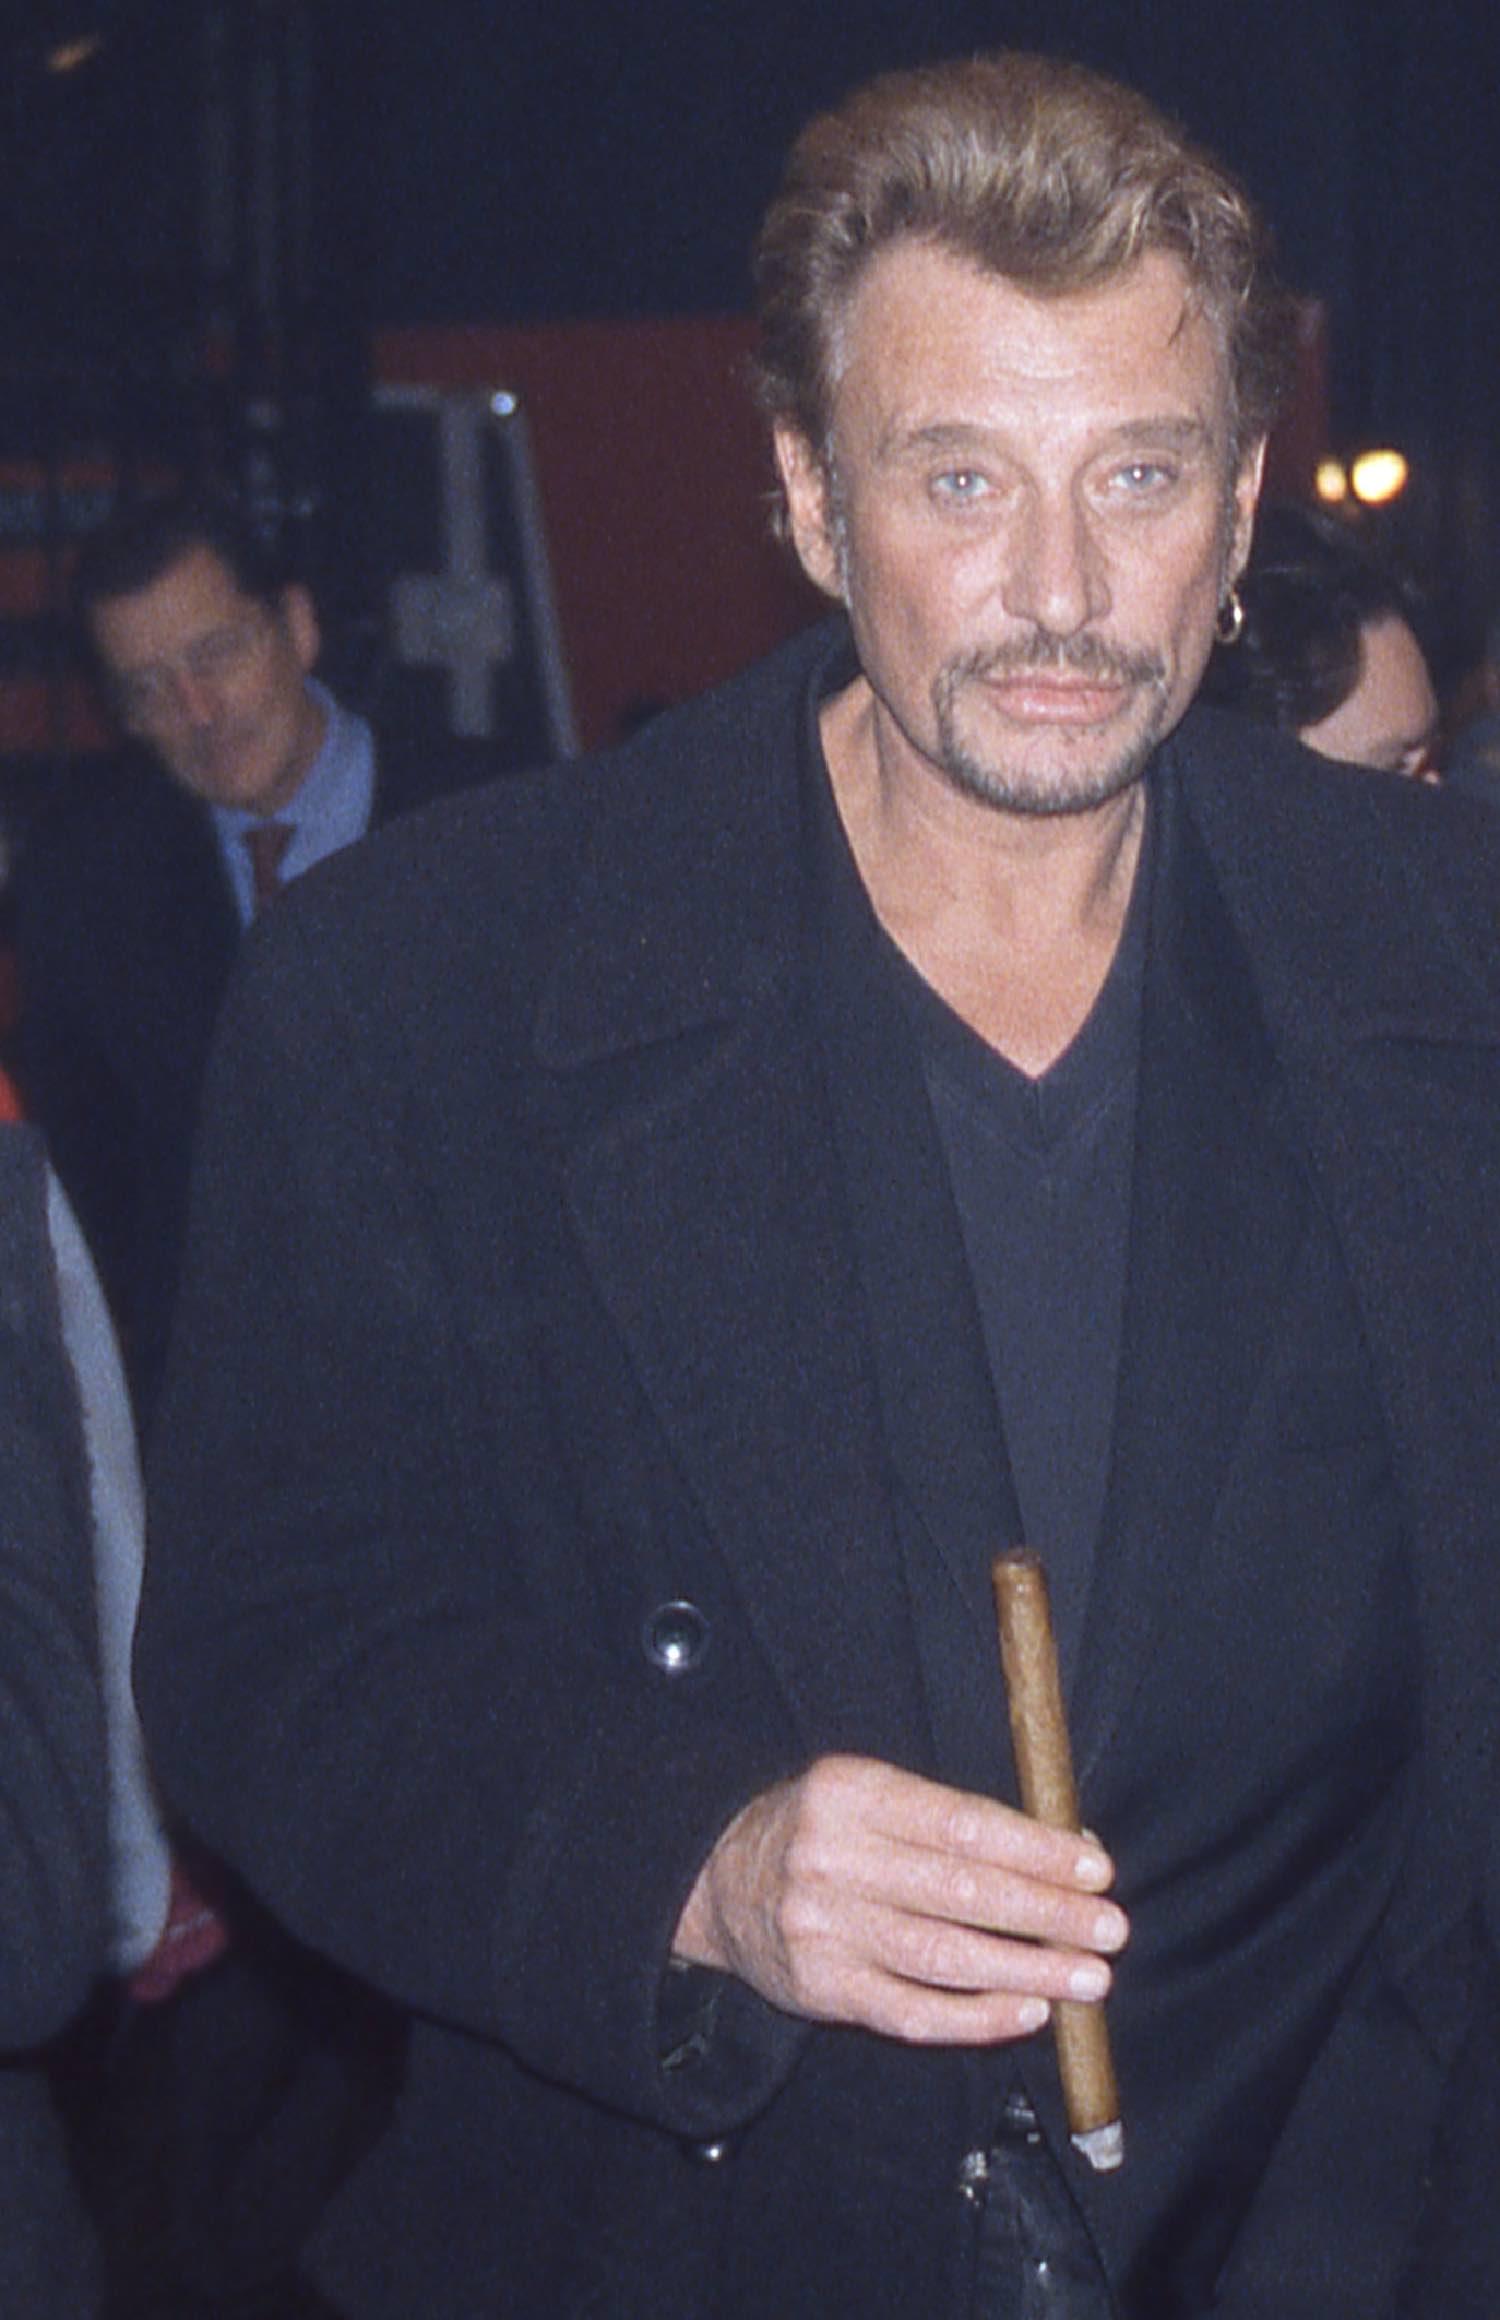 Johnny Hallyday | Les Enfoirés 1998 | Paris | Photo sandrine cohen